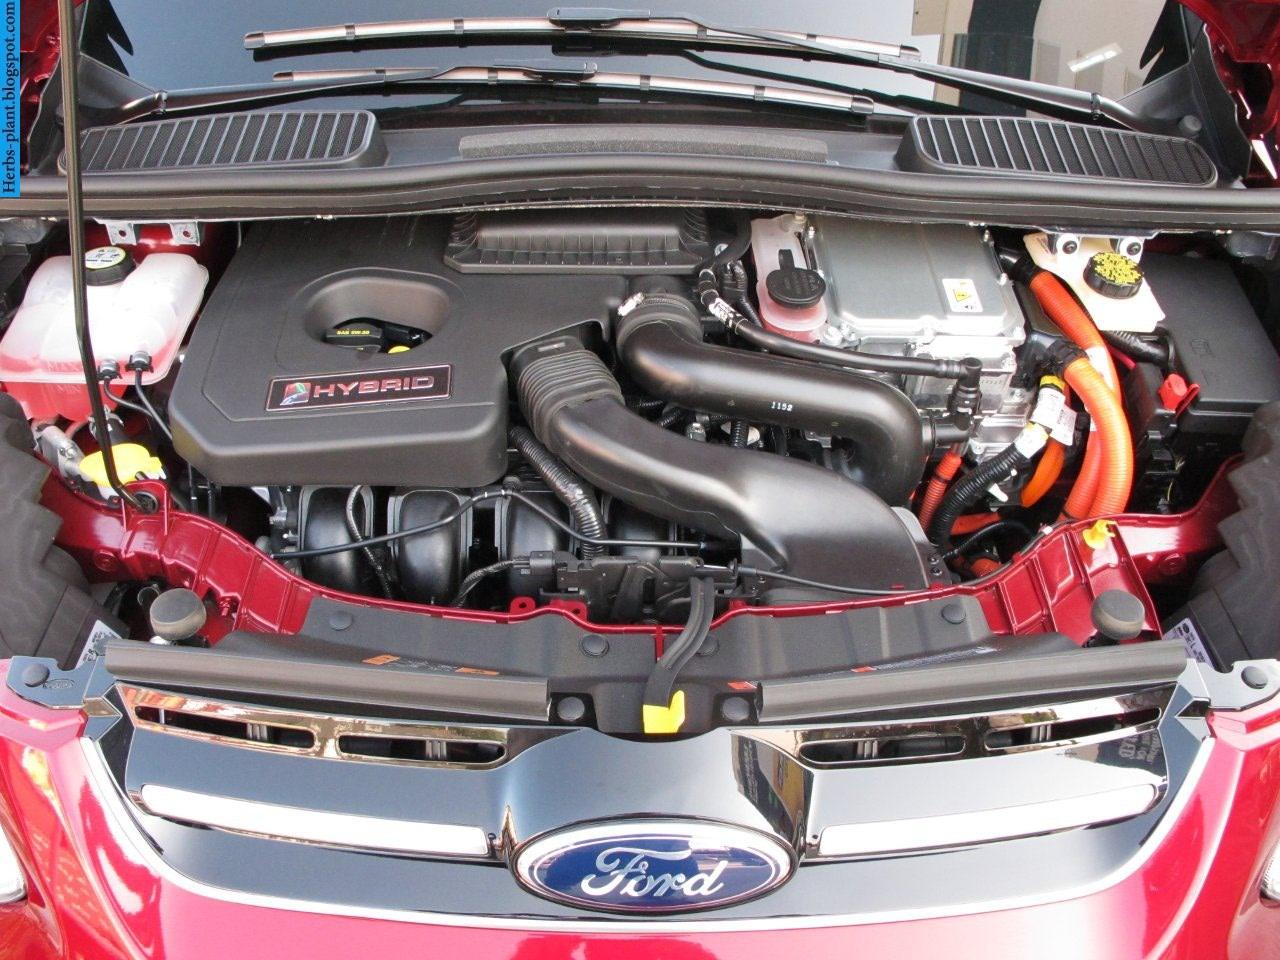 Ford c-max car 2013 engine - صور محرك سيارة فورد سي-ماكس 2013